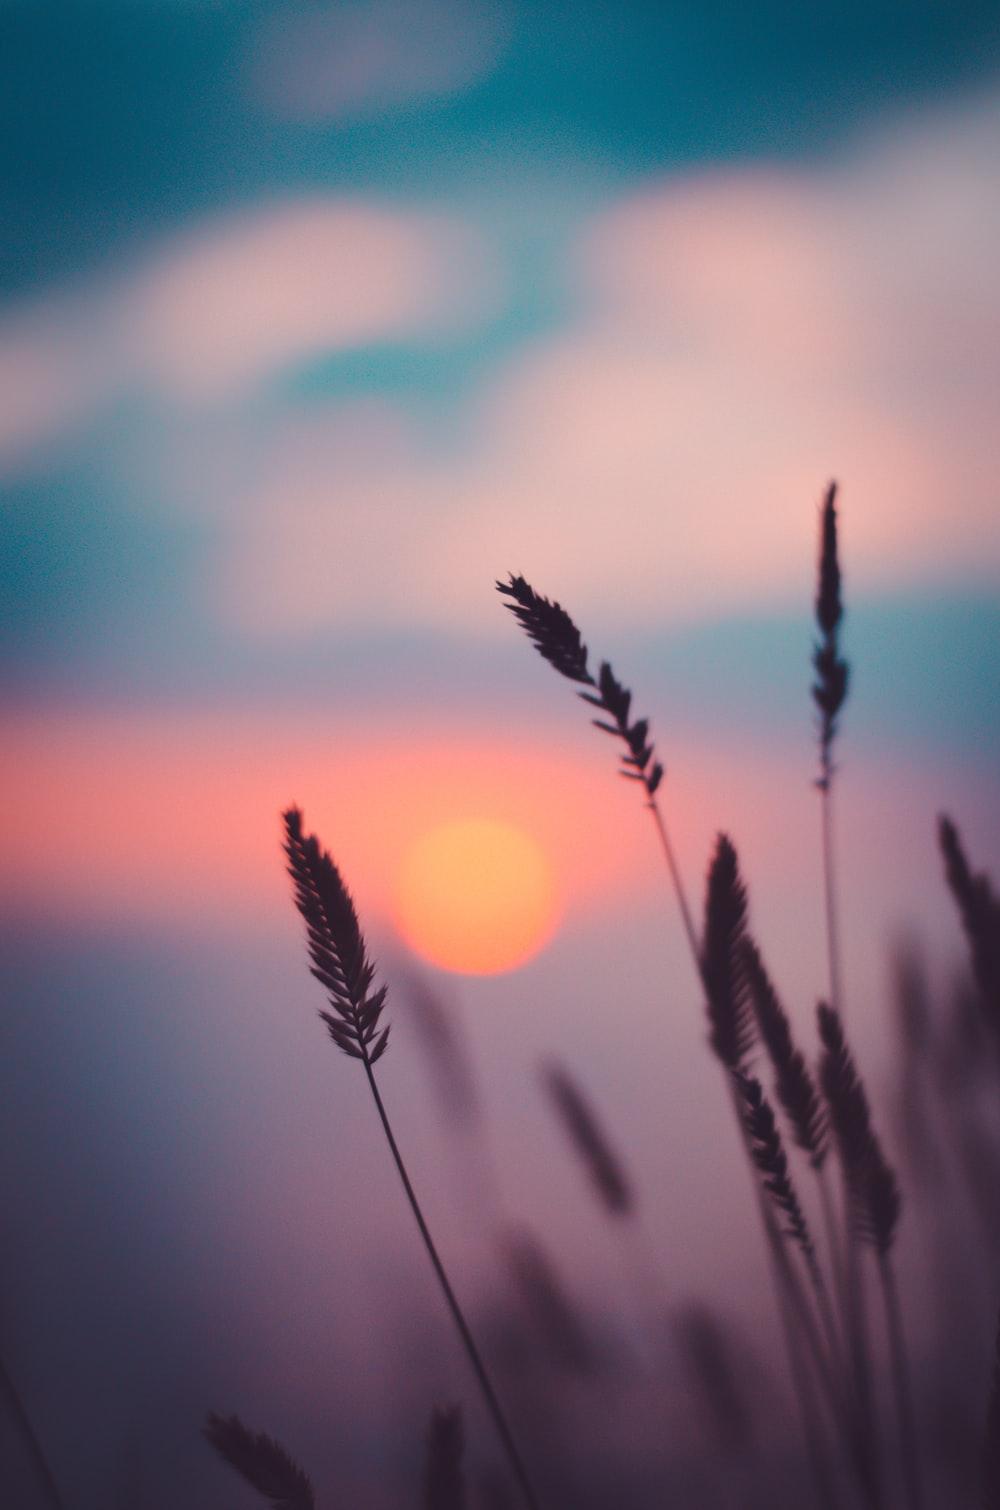 12+ Sunset Images [Stunning]   Download Free Images on Unsplash